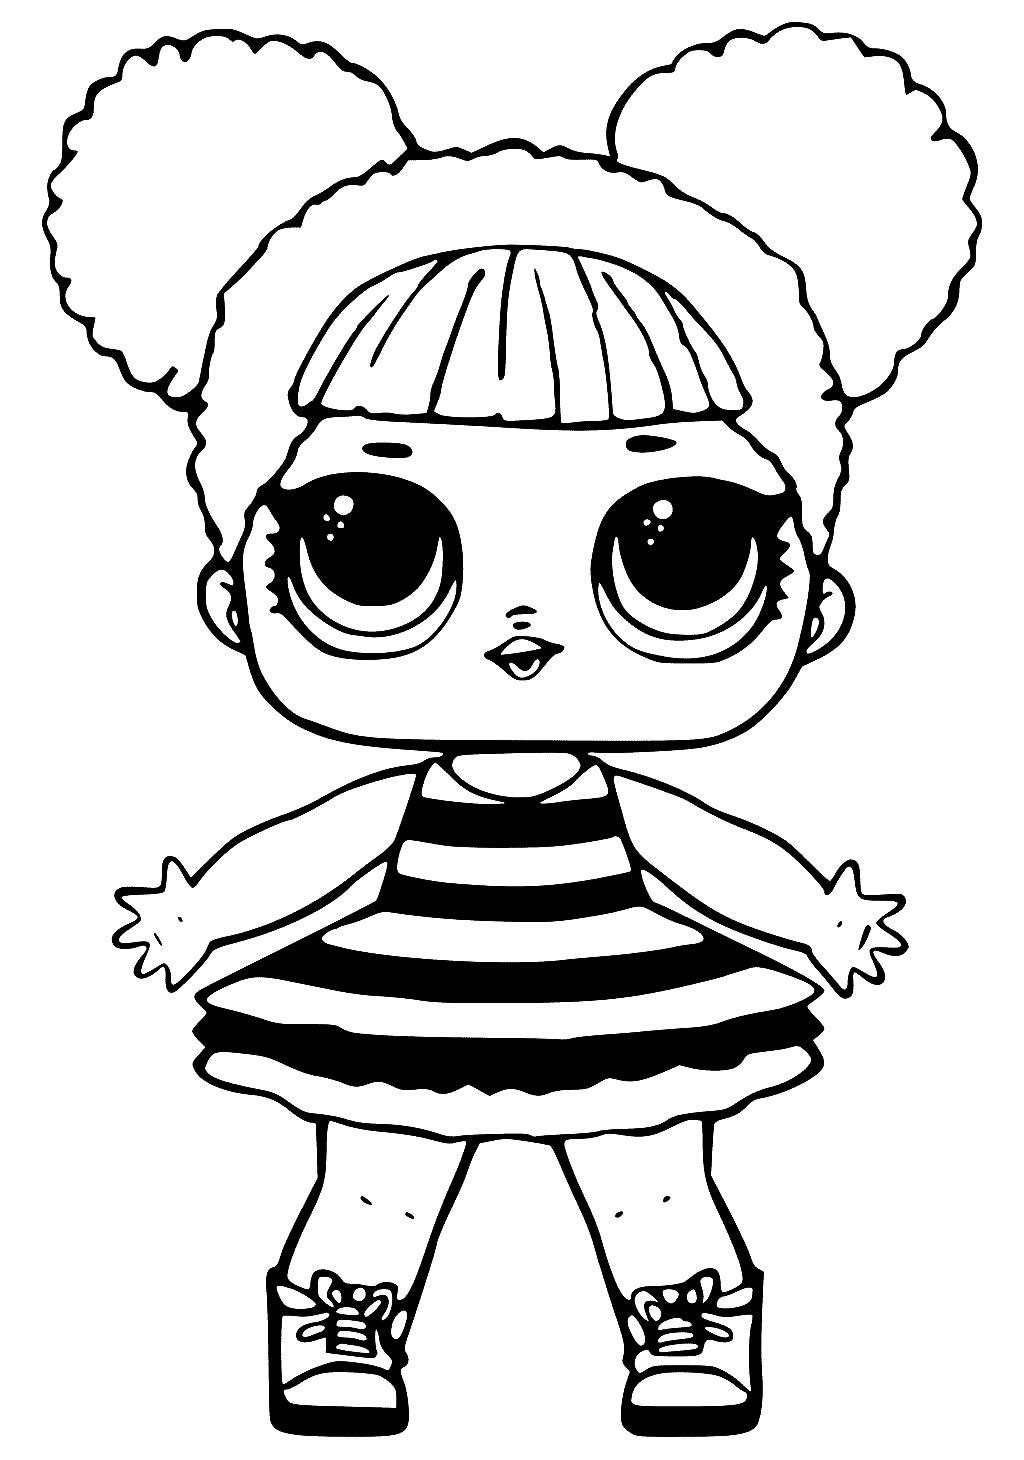 Imagem de Boneca LOL para colorir